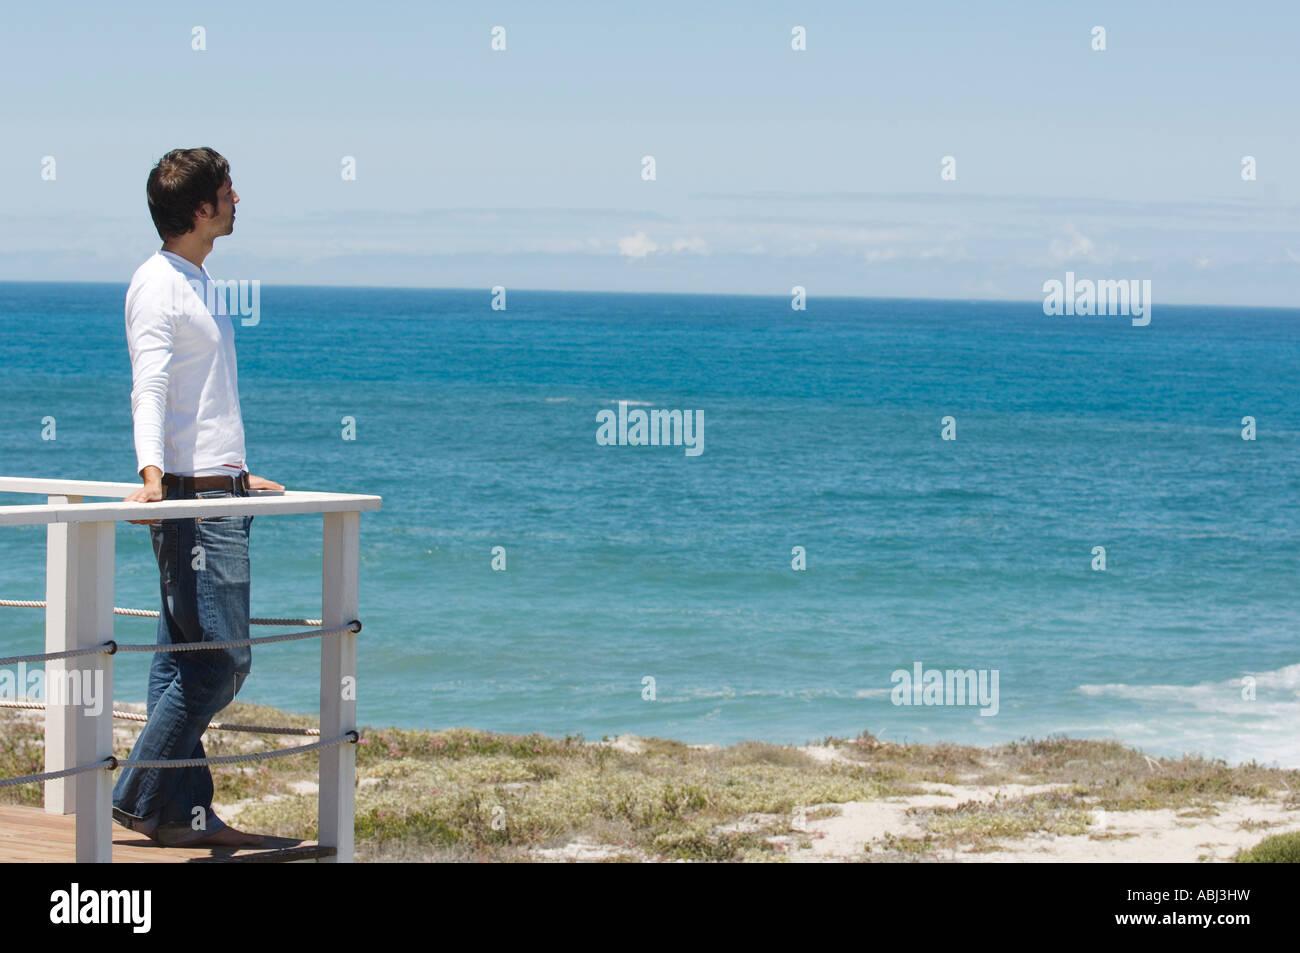 Young man leaning against balustrade, regardant la mer Banque D'Images